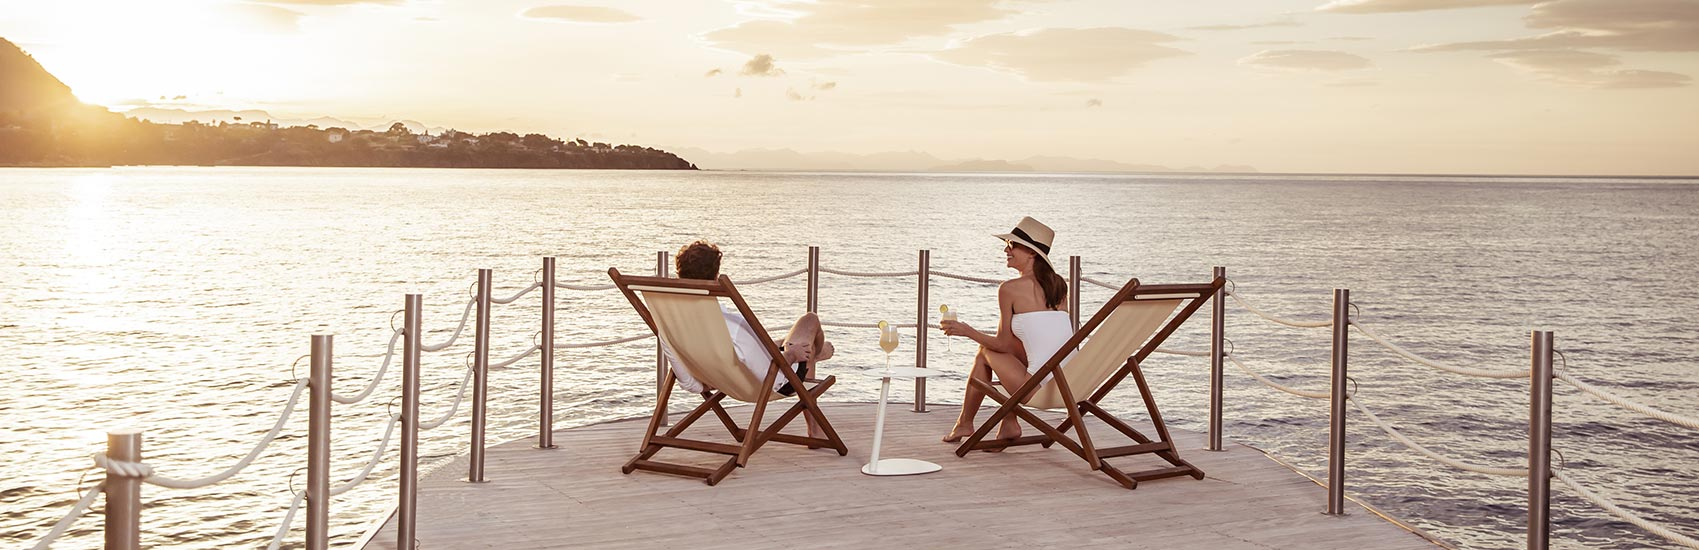 Club Med Early Booking Savings 3